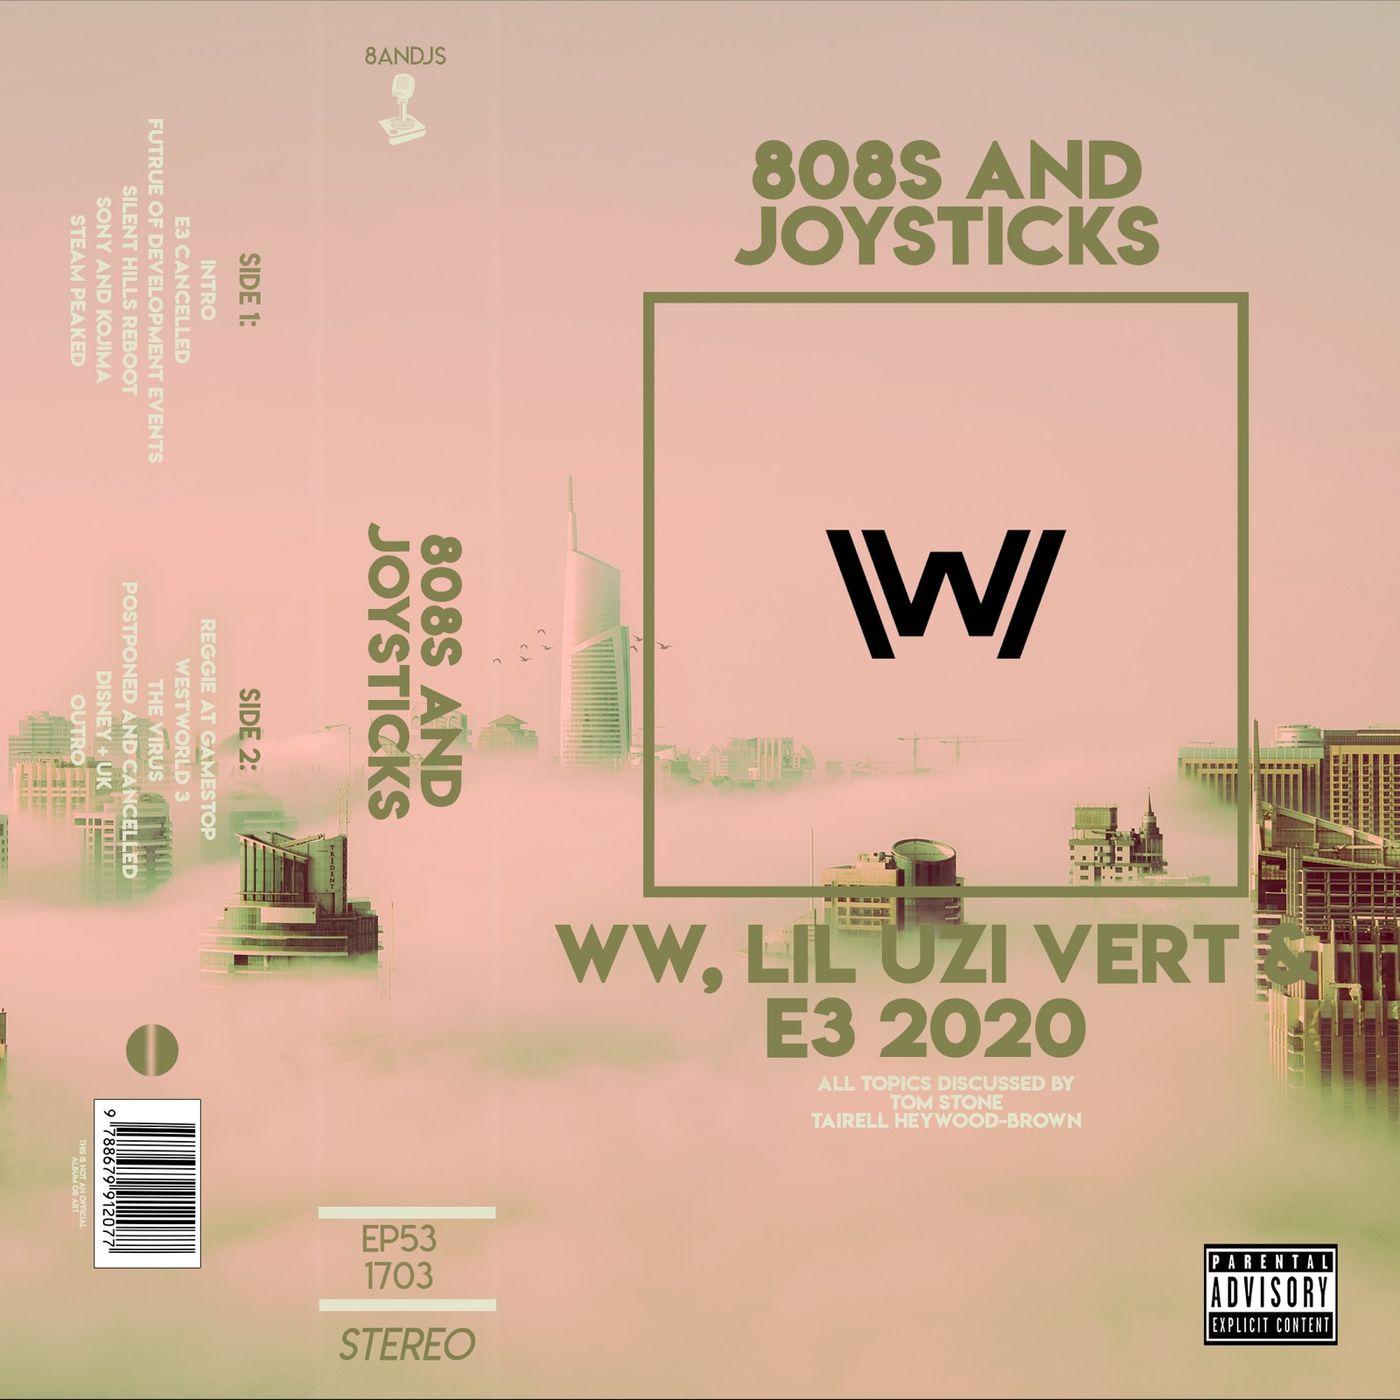 Episode 53: Westworld, Lil Uzi Vert and E3 2020